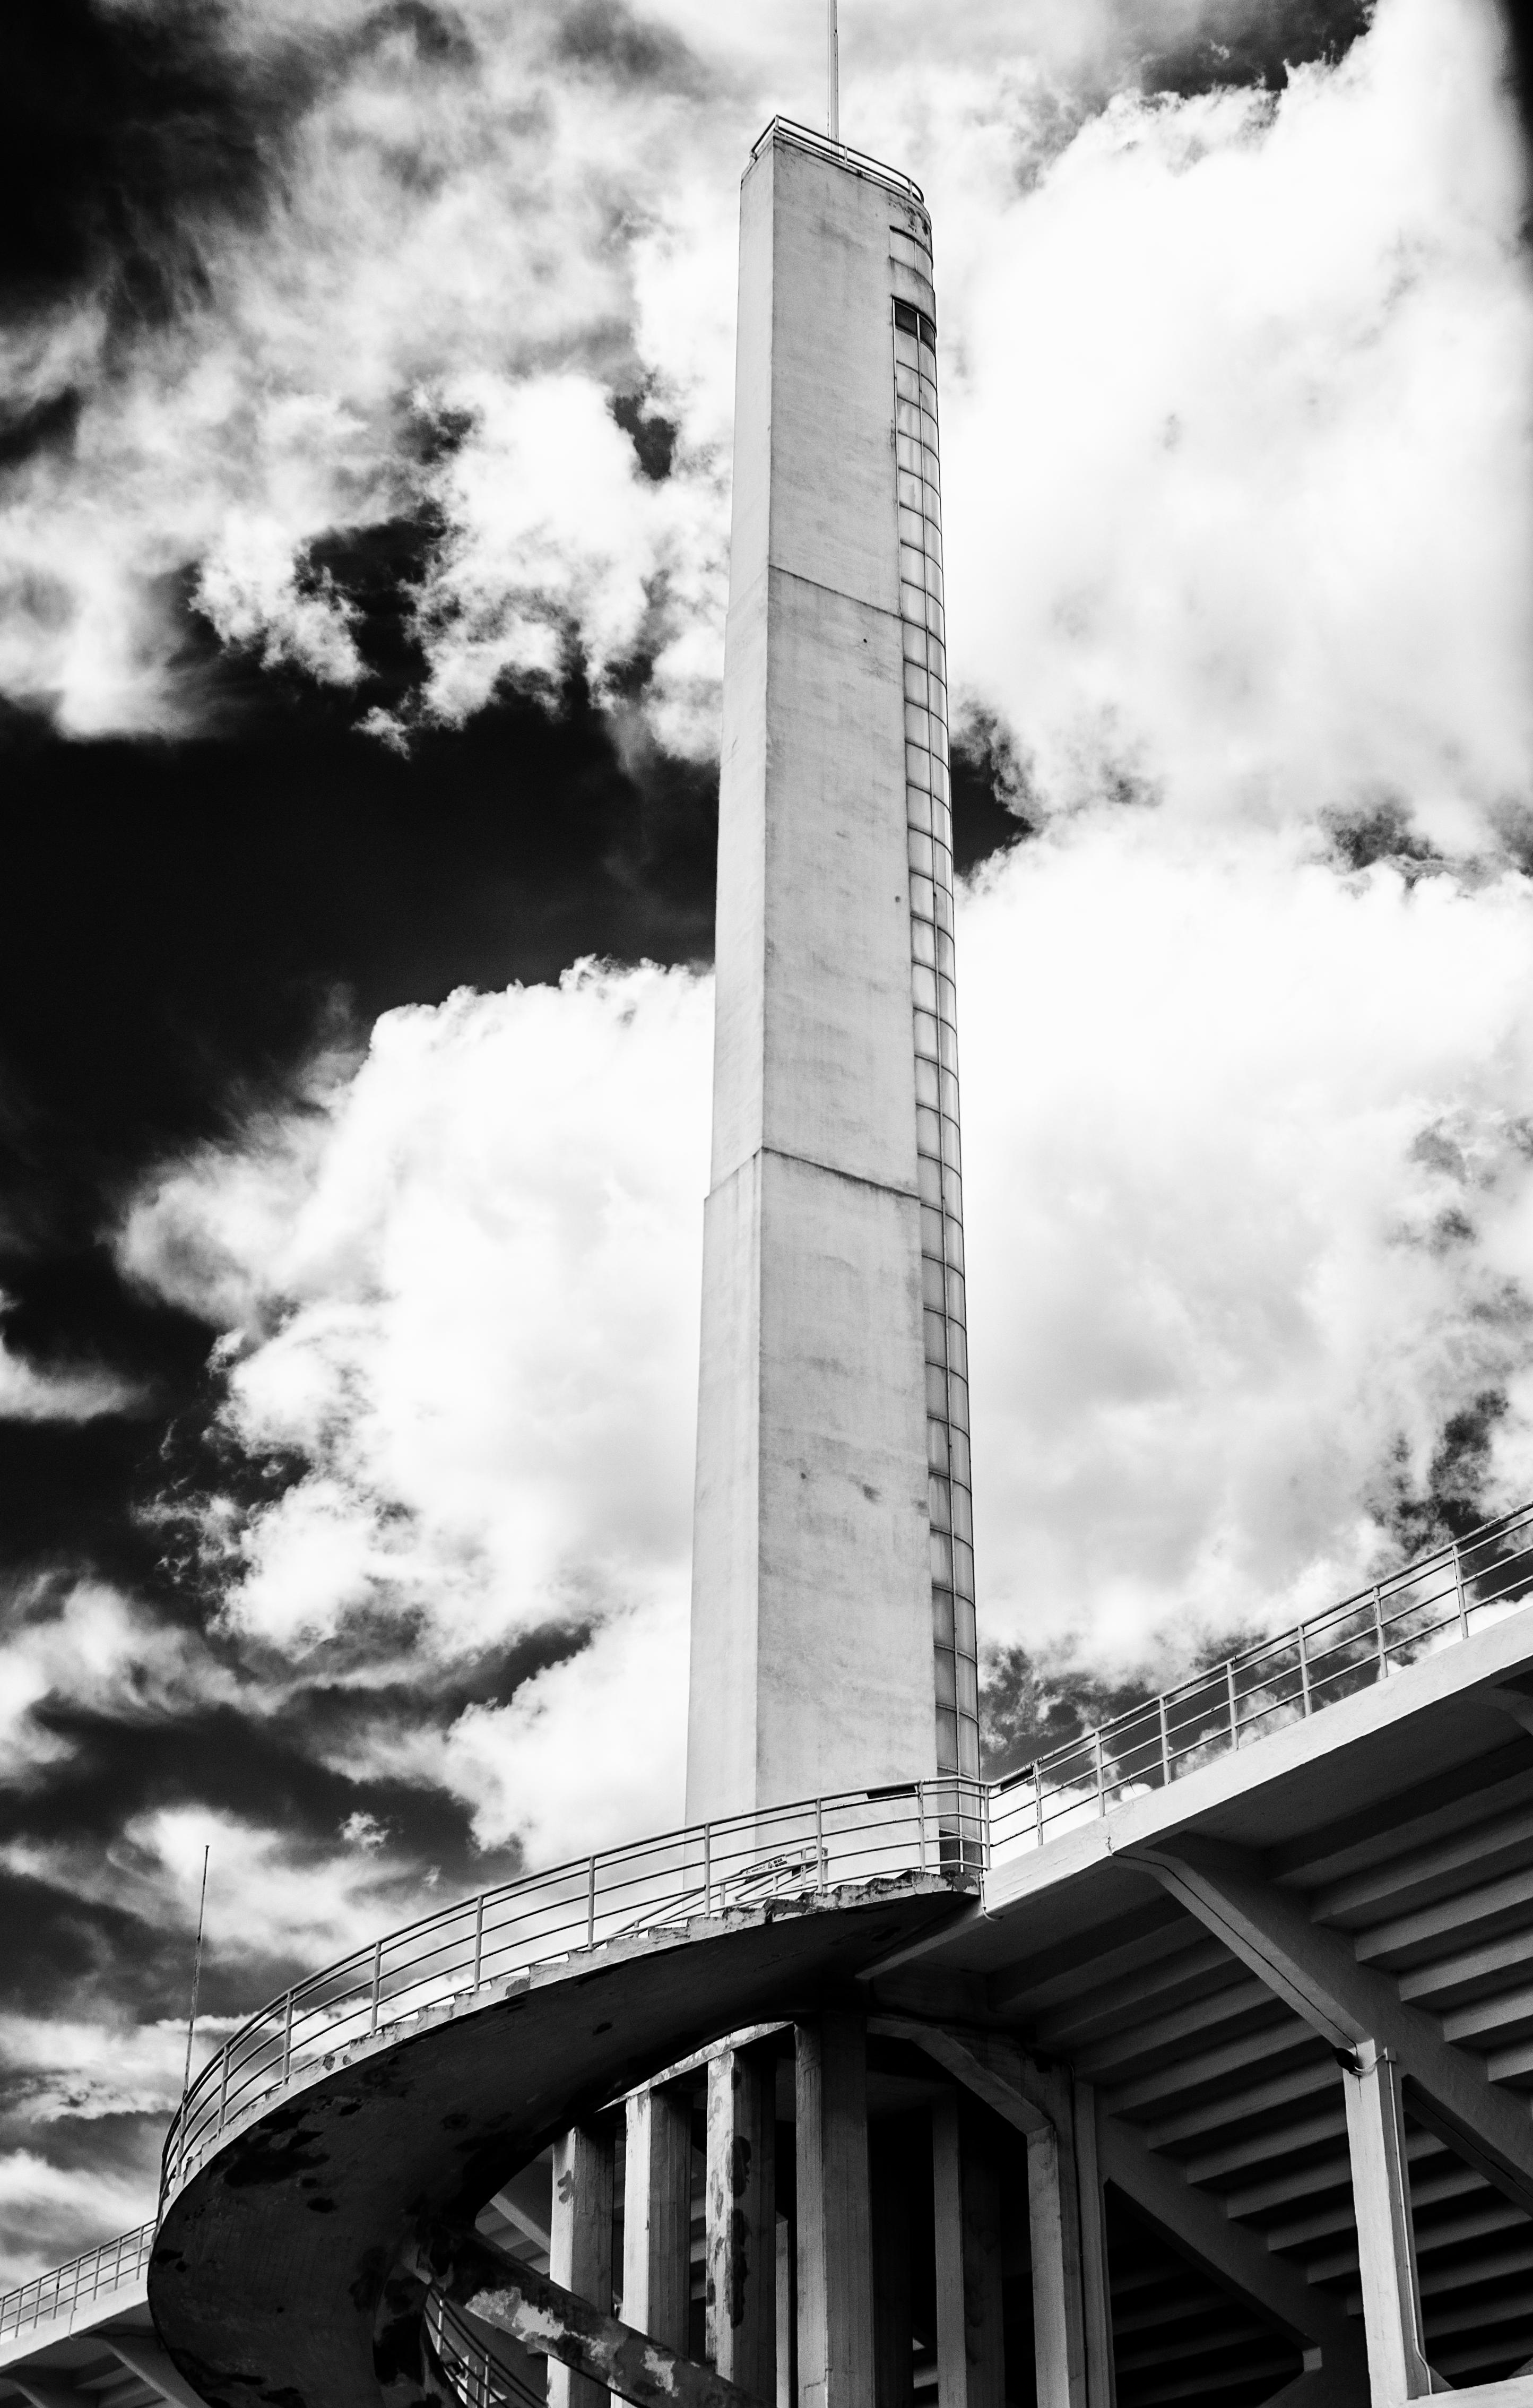 Tower of Marathon